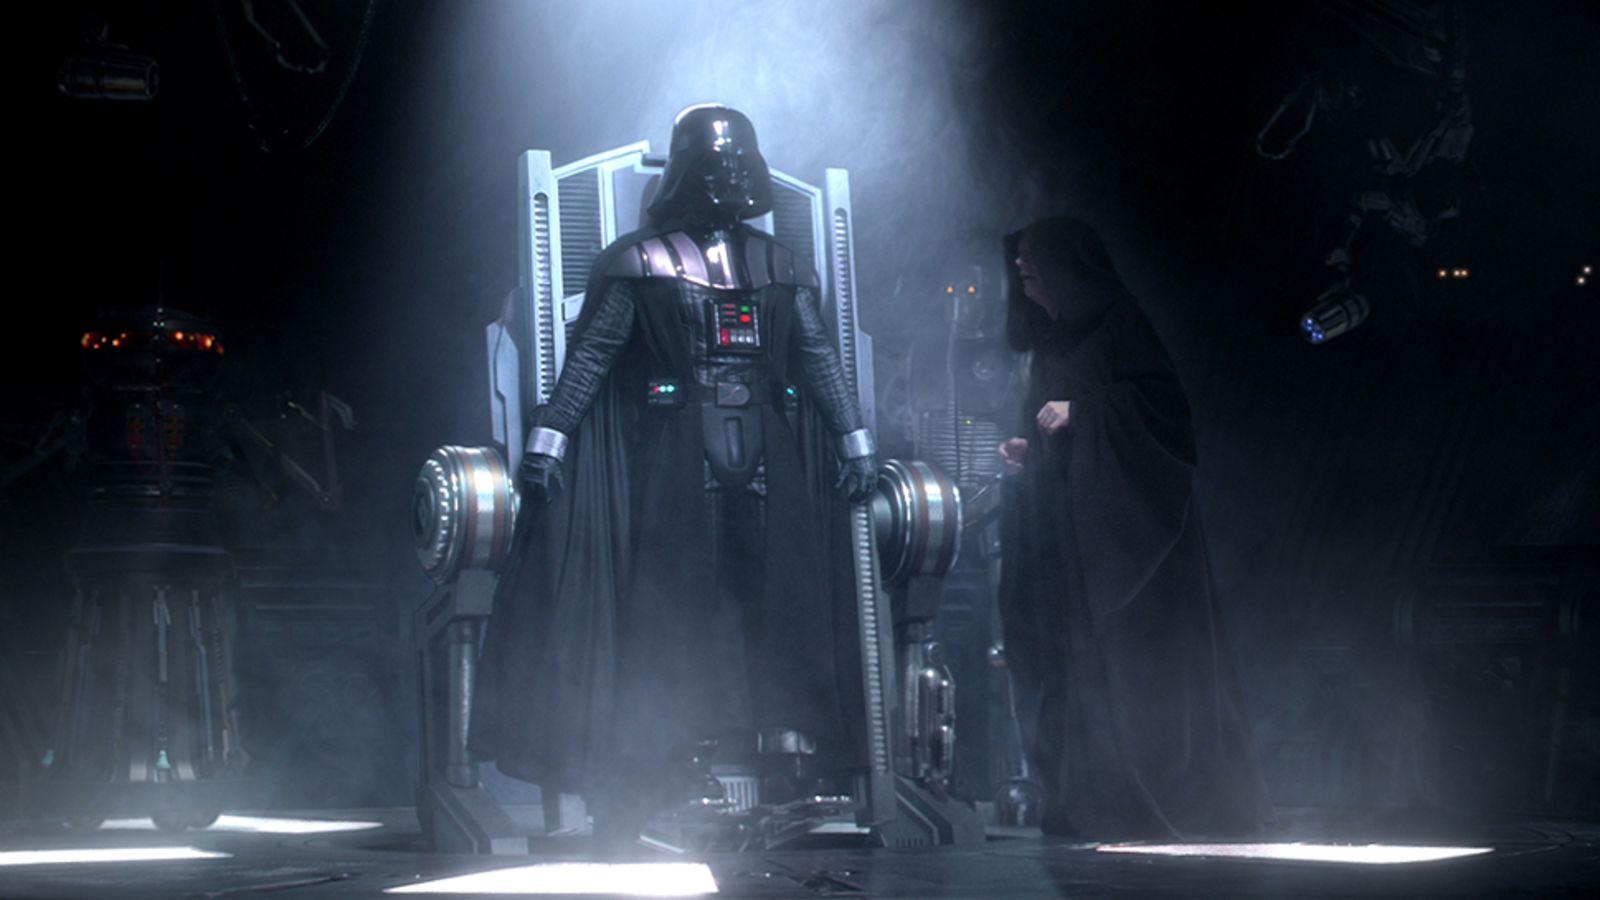 Darth_Vader_und_Darth_Sidious.jpg